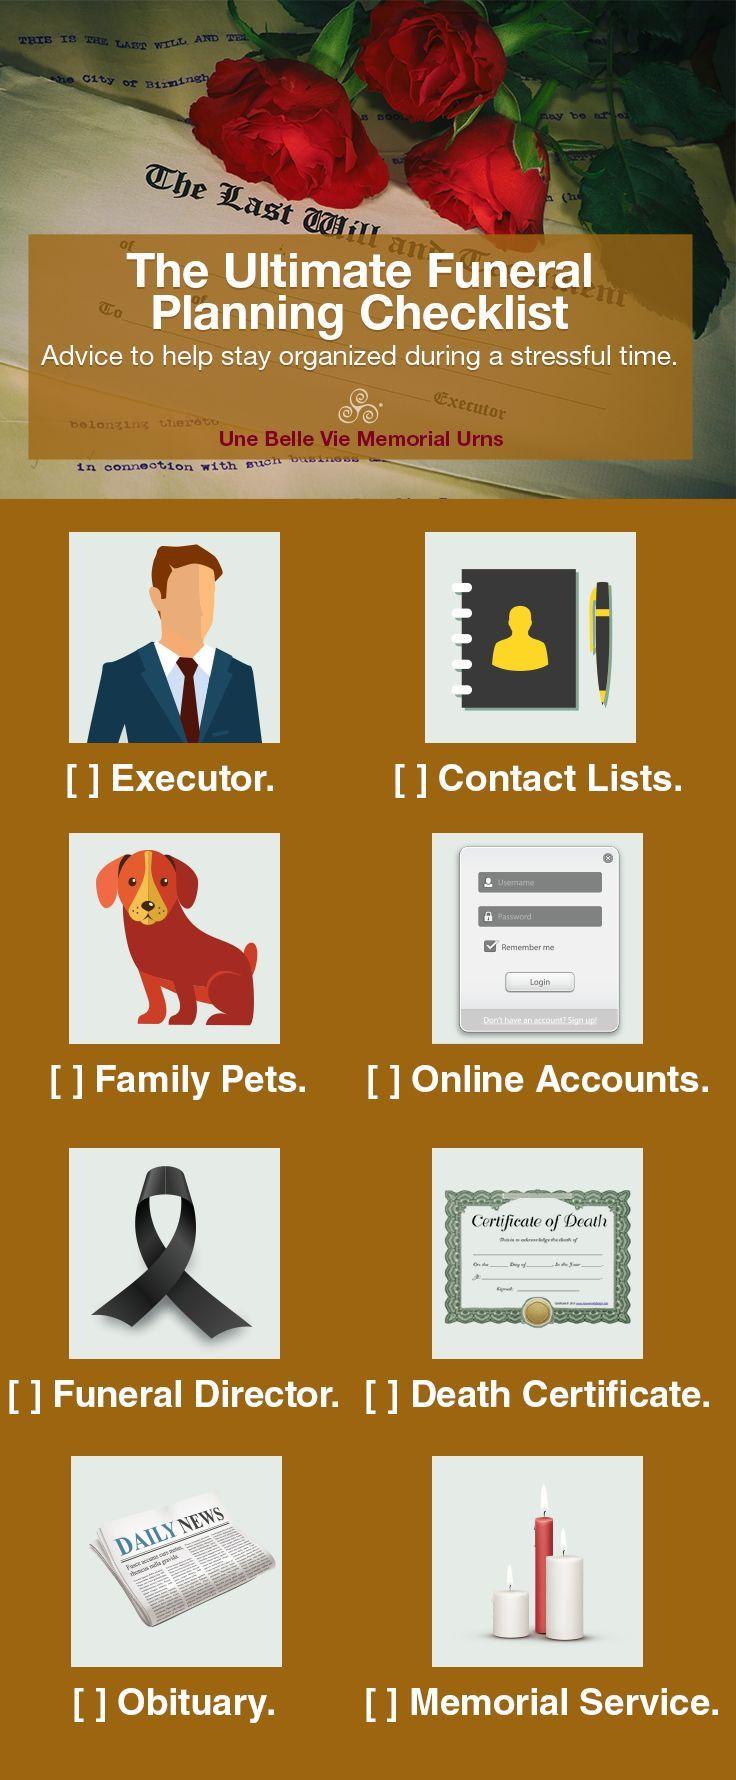 Funeral Planning Checklist to Help with Arrangements